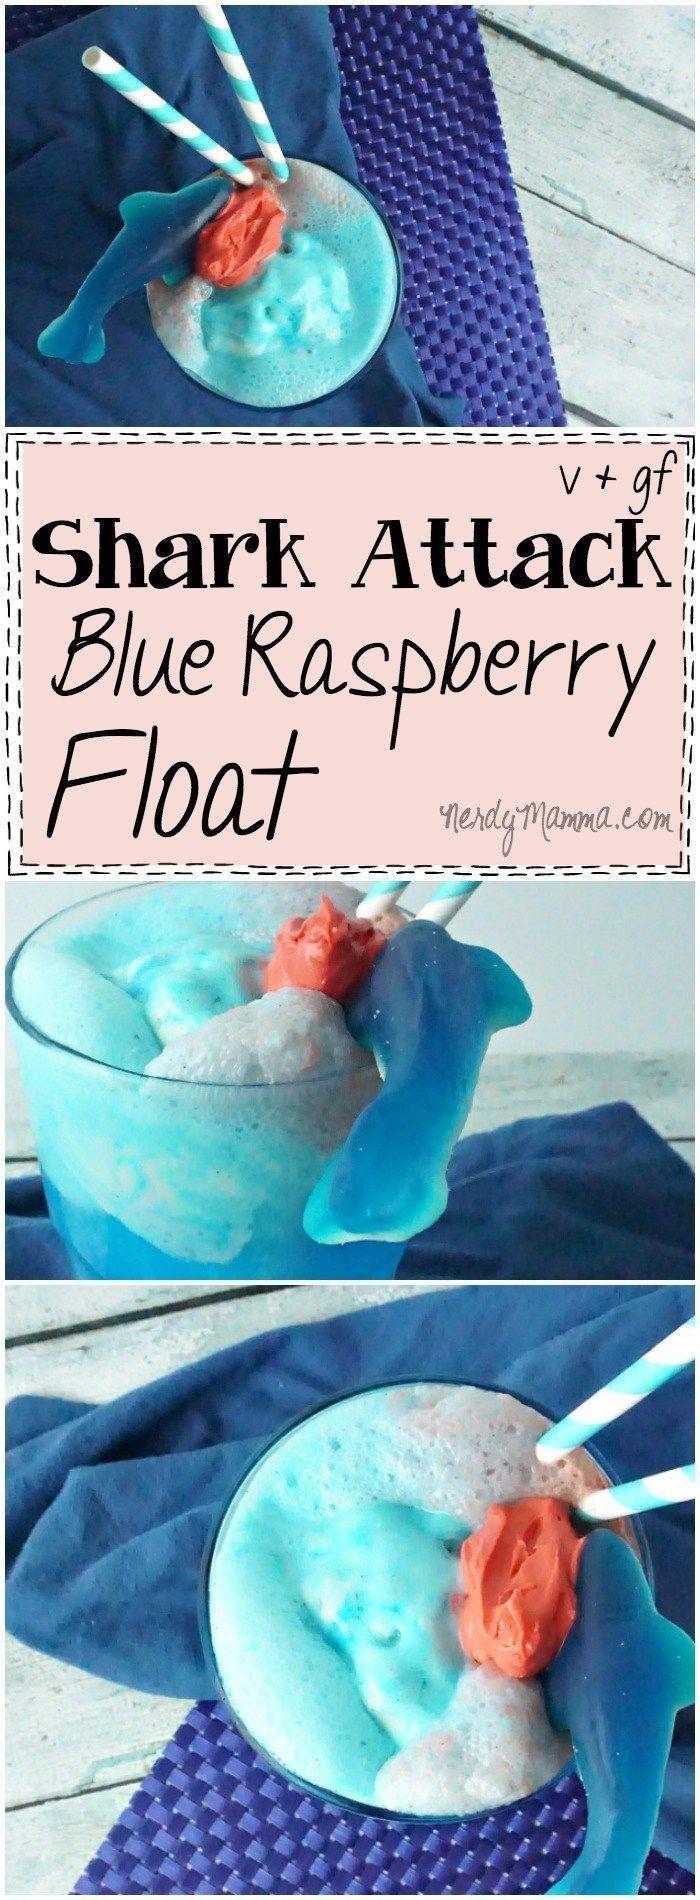 Shark Attack Float – AKA Blue Raspberry Float {Vegan and Gluten-Free}